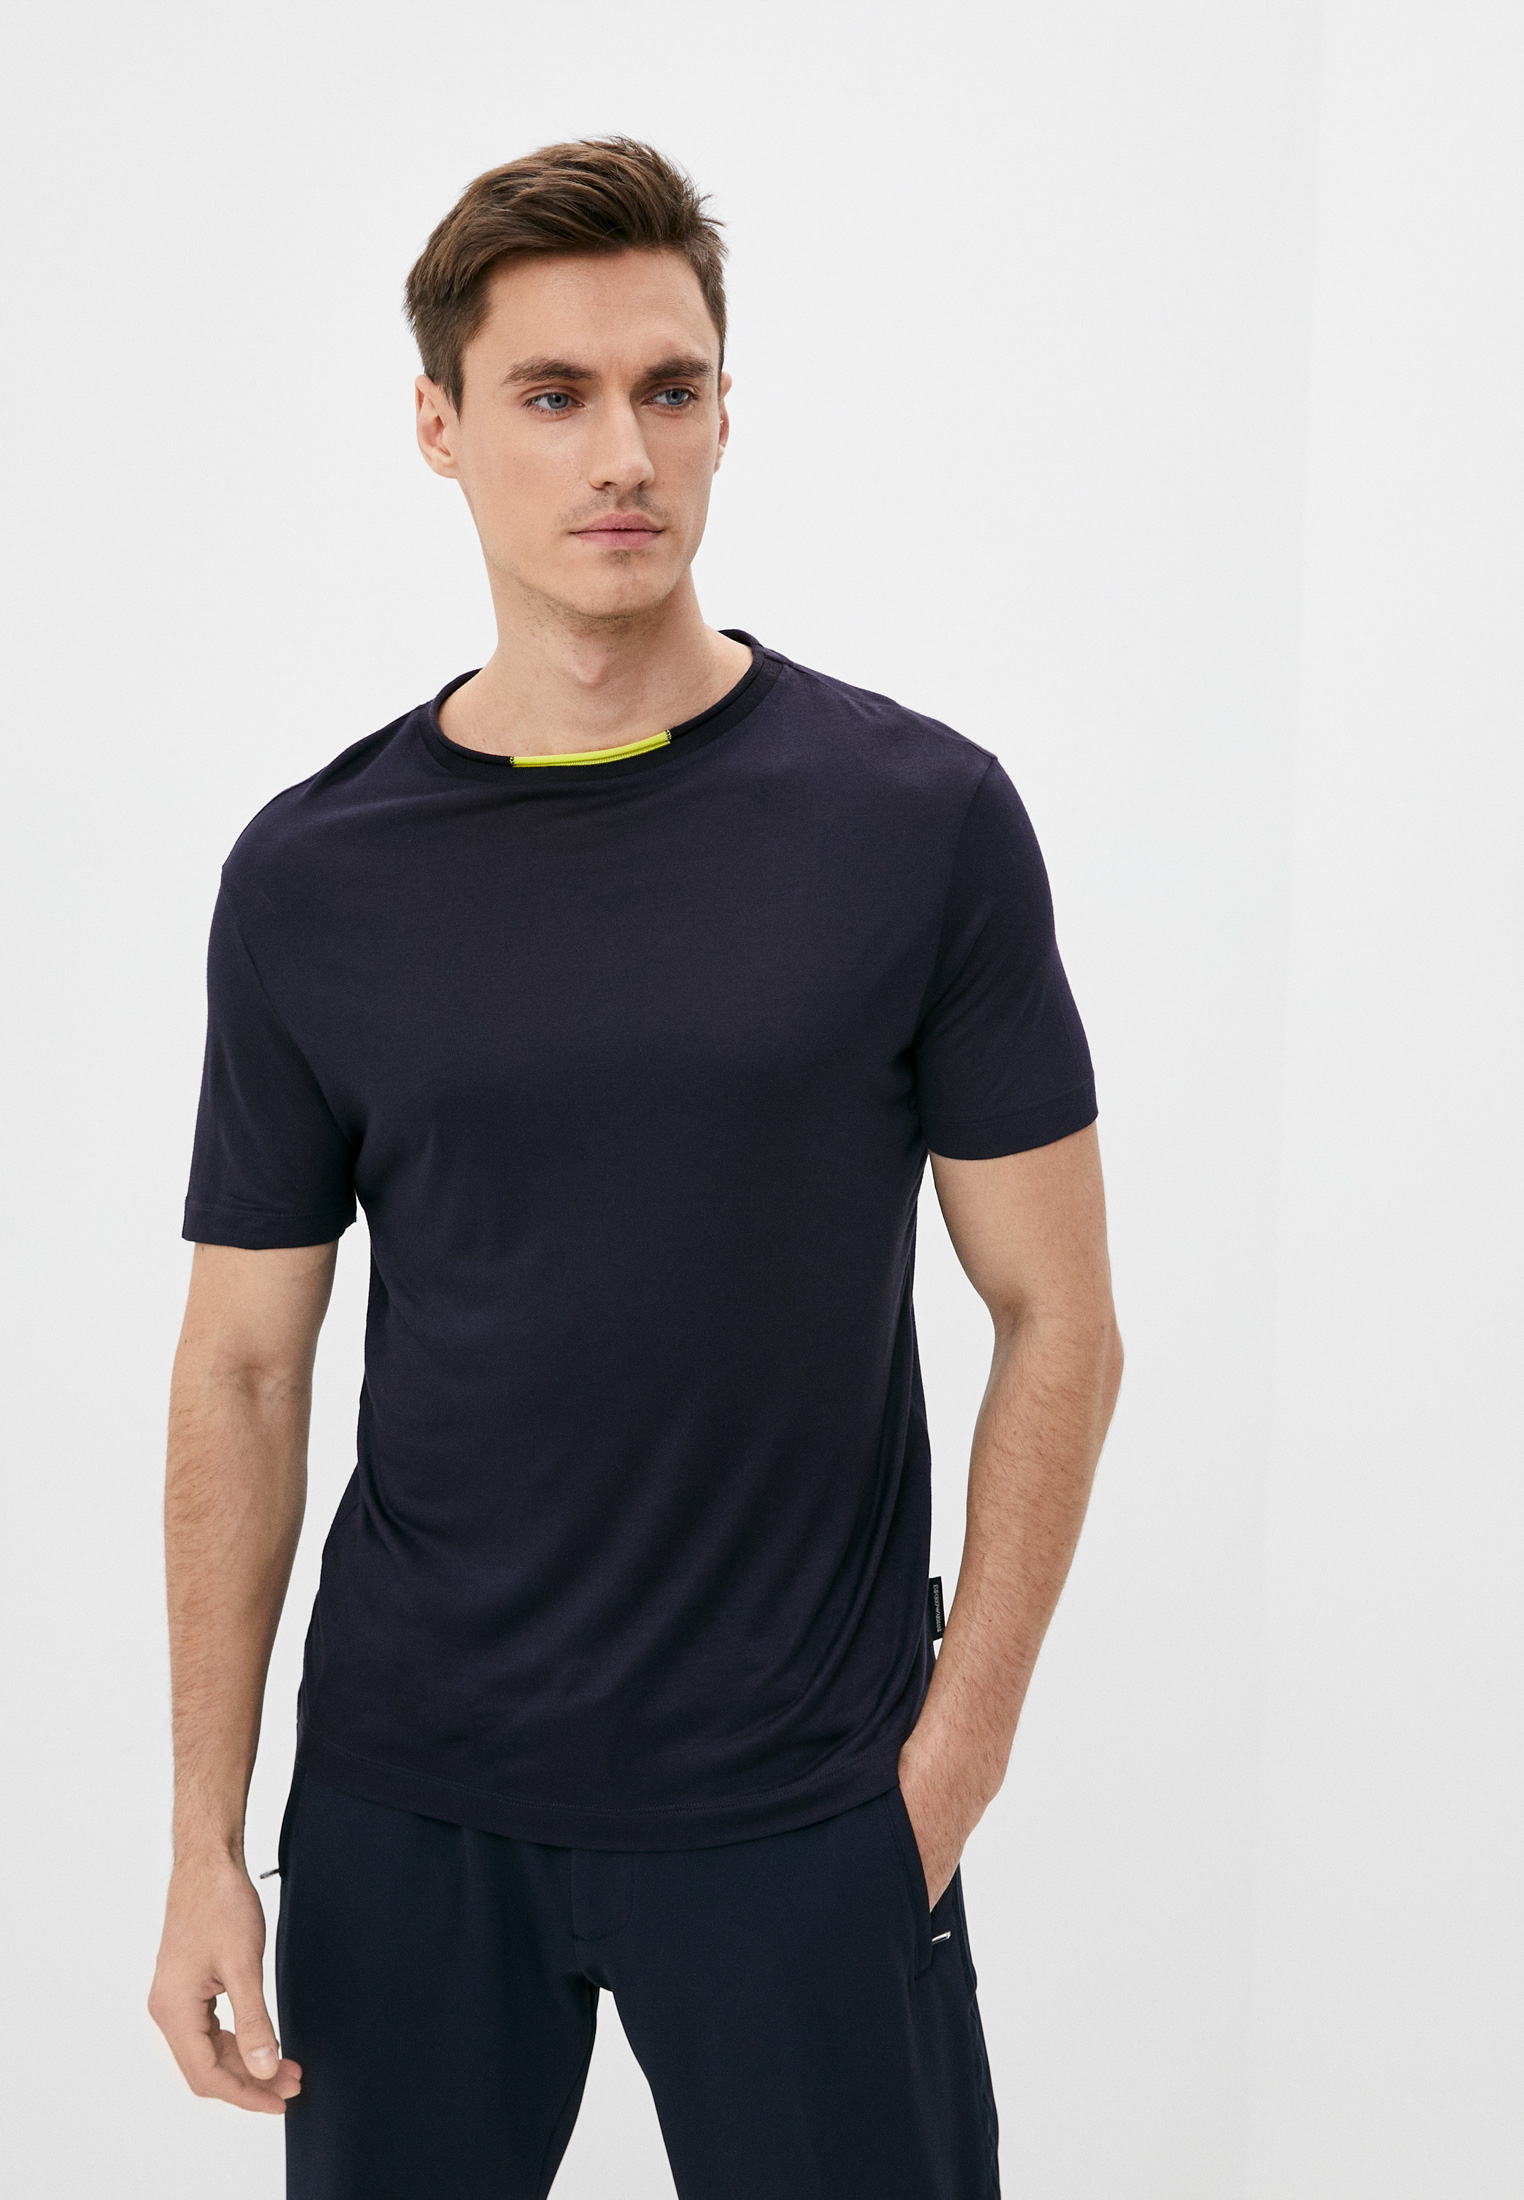 Мужская футболка Emporio Armani (Эмпорио Армани) 3Z1M6C 1JABZ